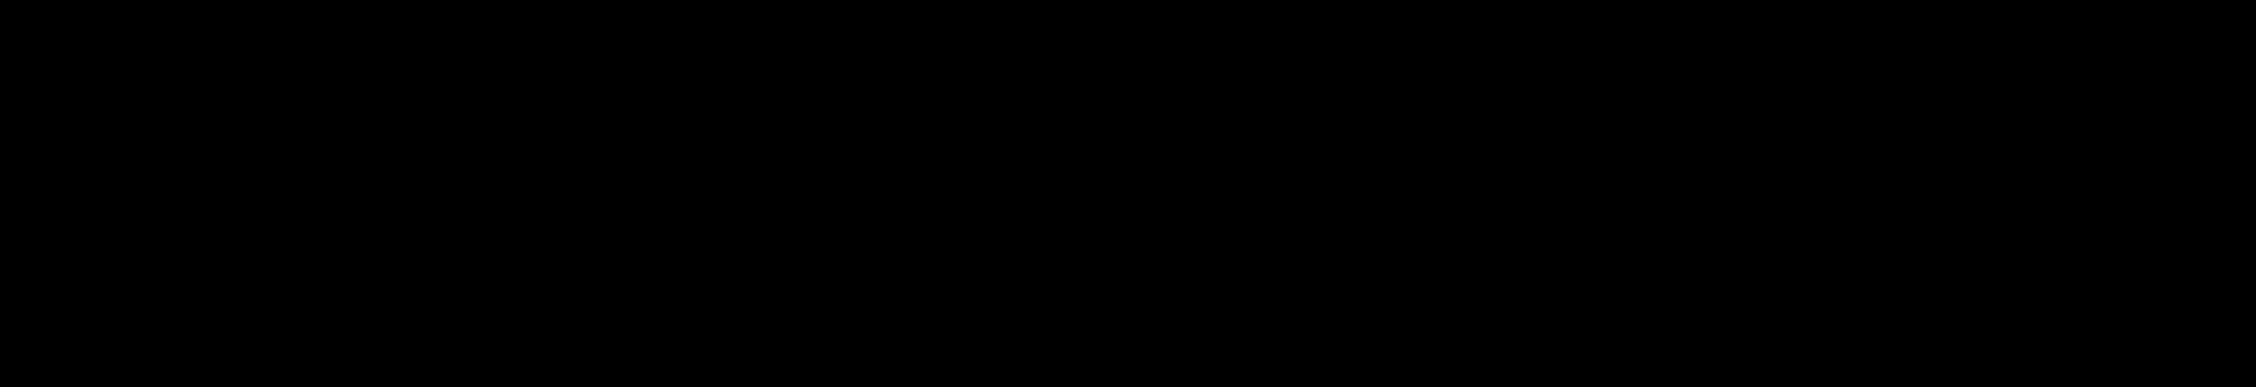 Gerber Logo